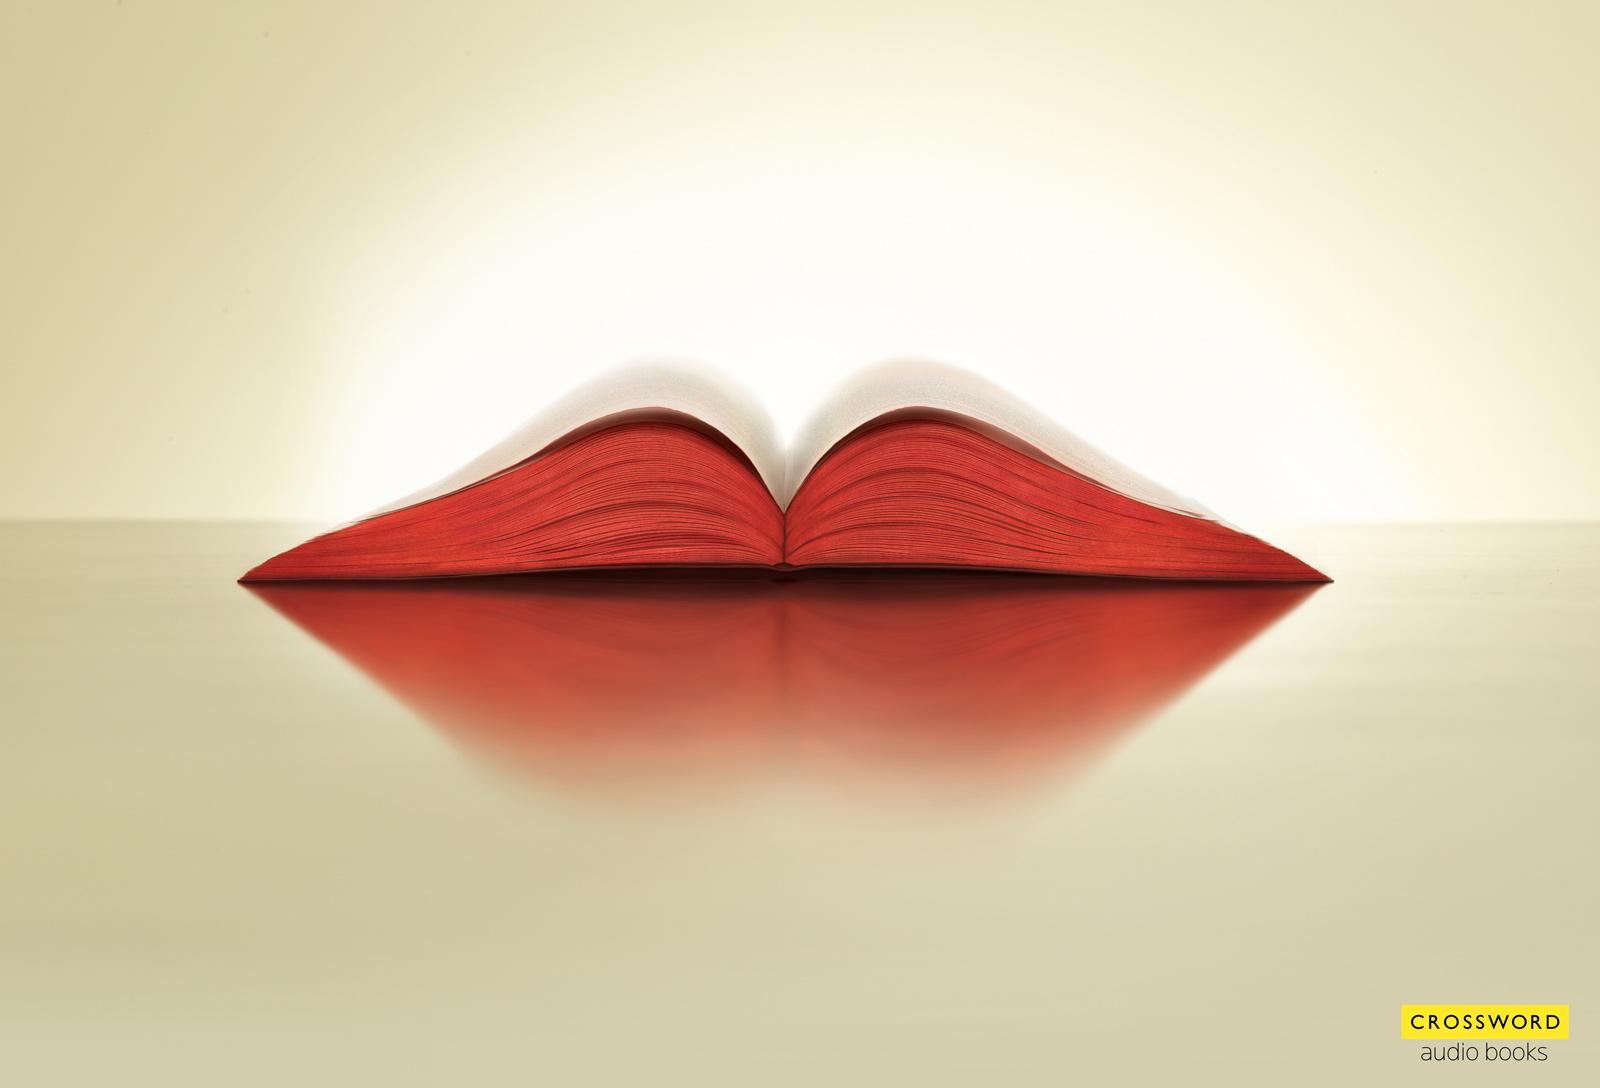 crossword audio books print ad   lips ads pinterest